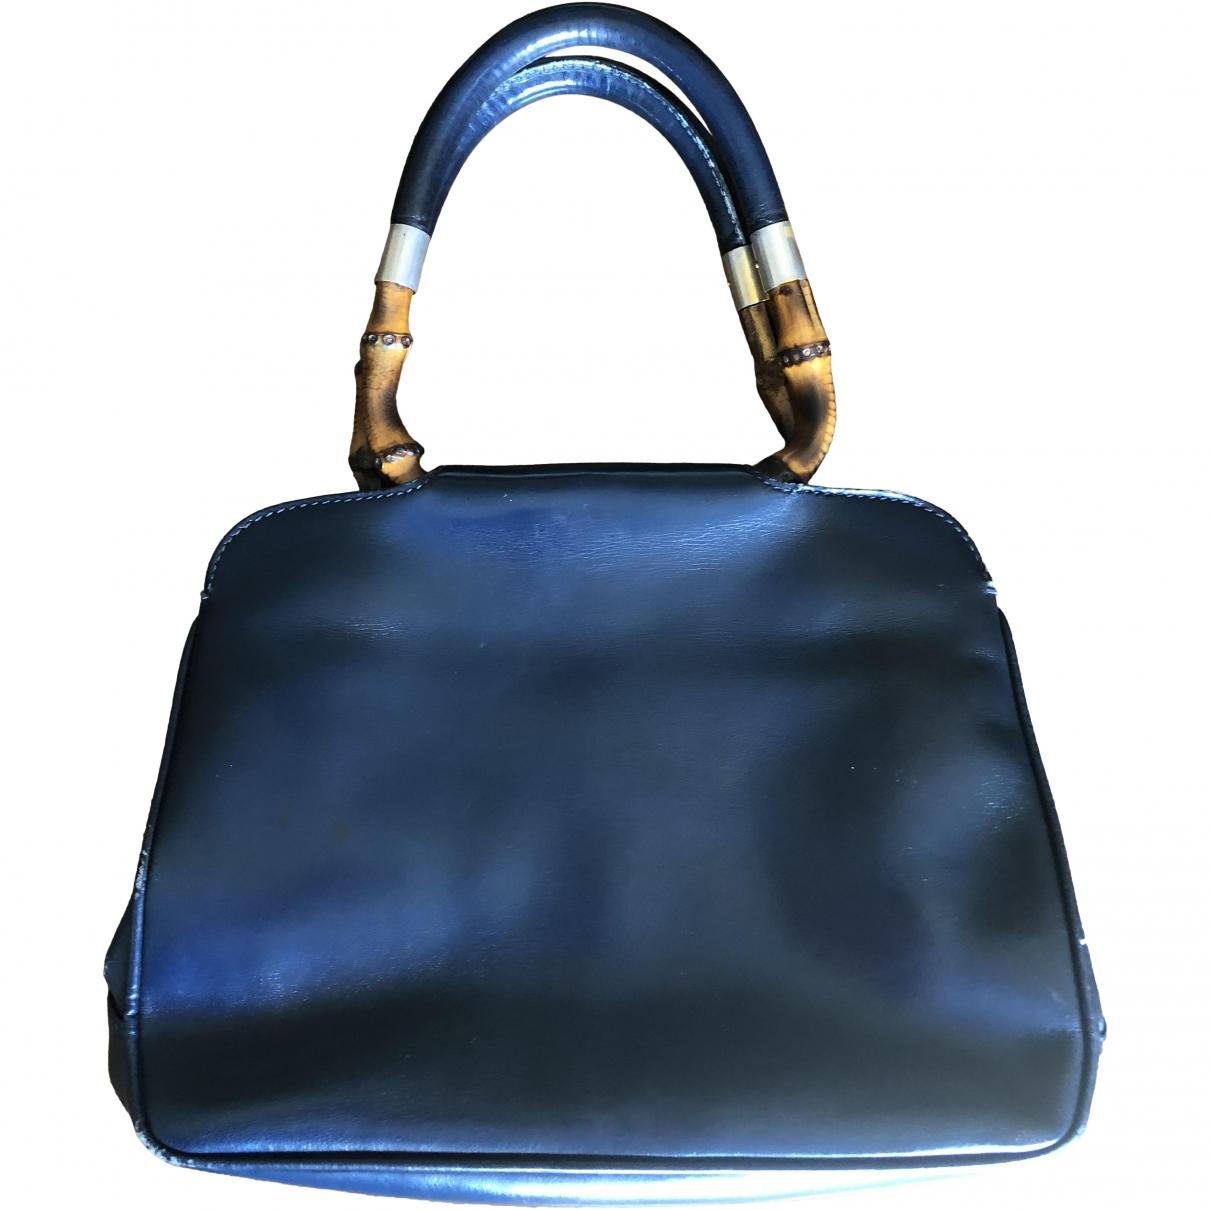 Gucci Bamboo Blue Leather handbag for Women \N